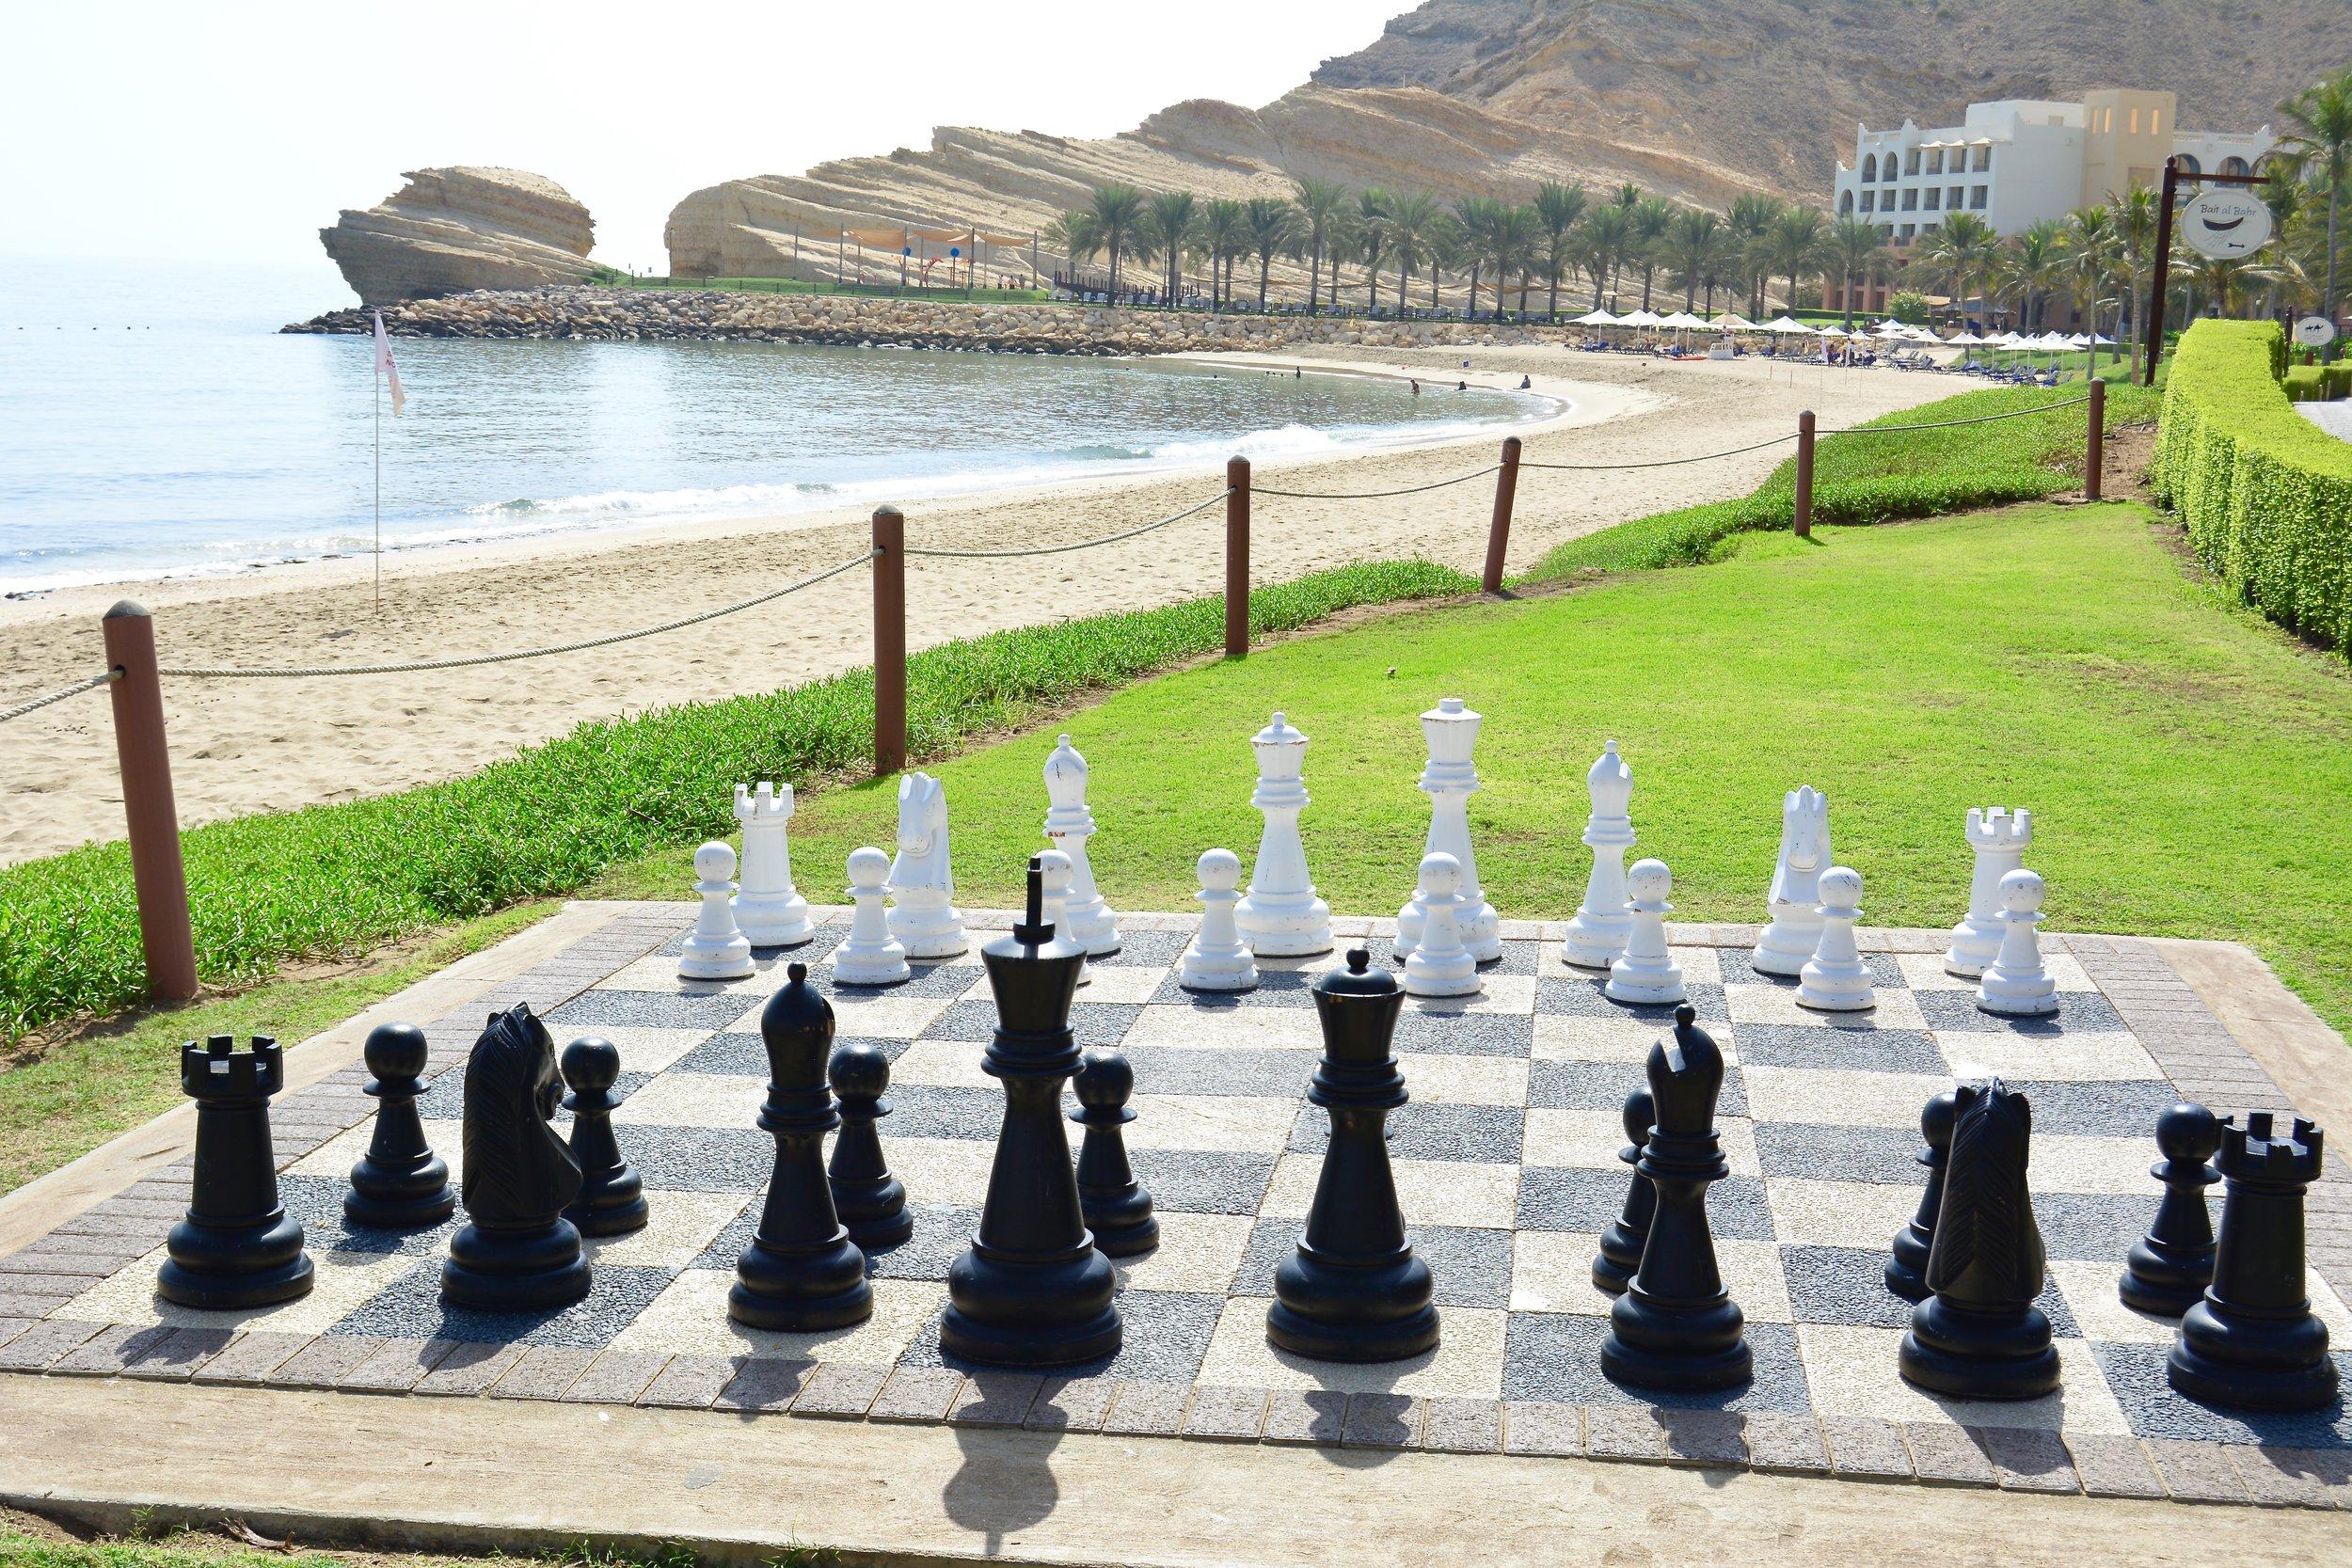 Al Bandar - Giant Chess Board (Shangri-La Muscat)